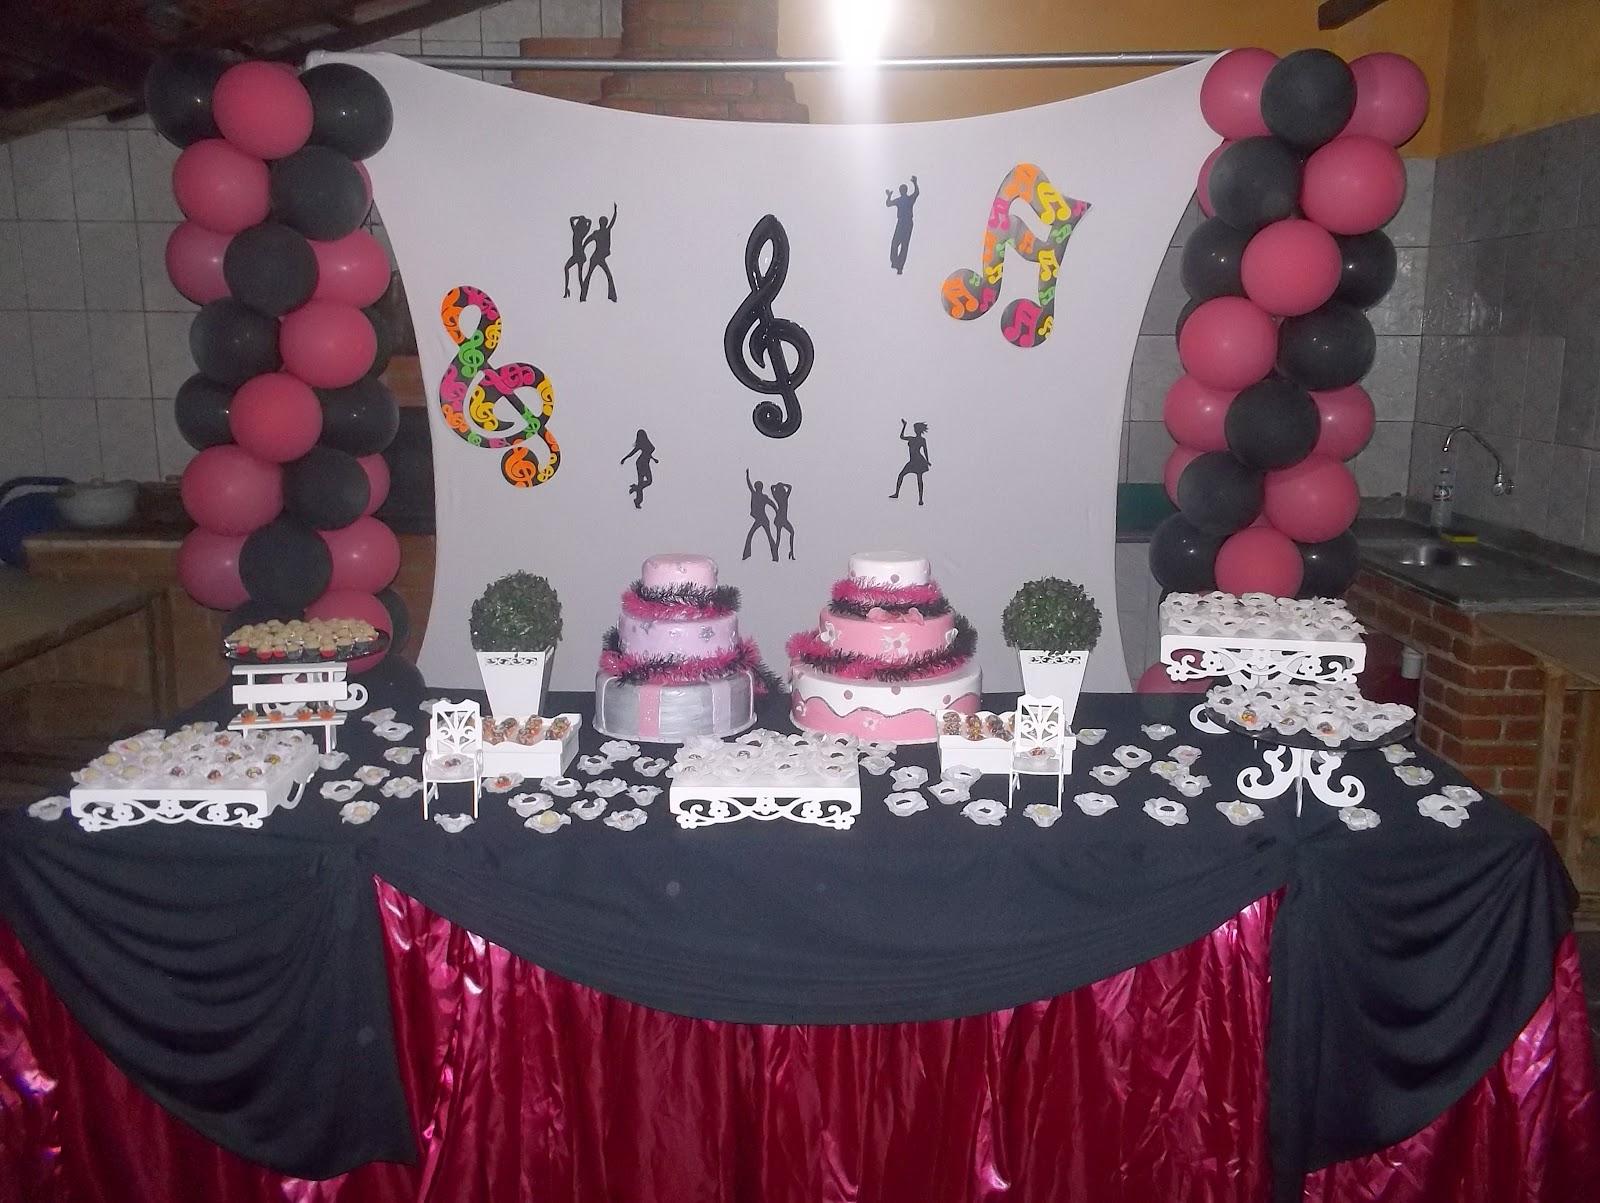 decoracao festa balada infantil: Provencal , Festa , Infantil,Locação: DECORACAO TEEN MUSICA BALADA